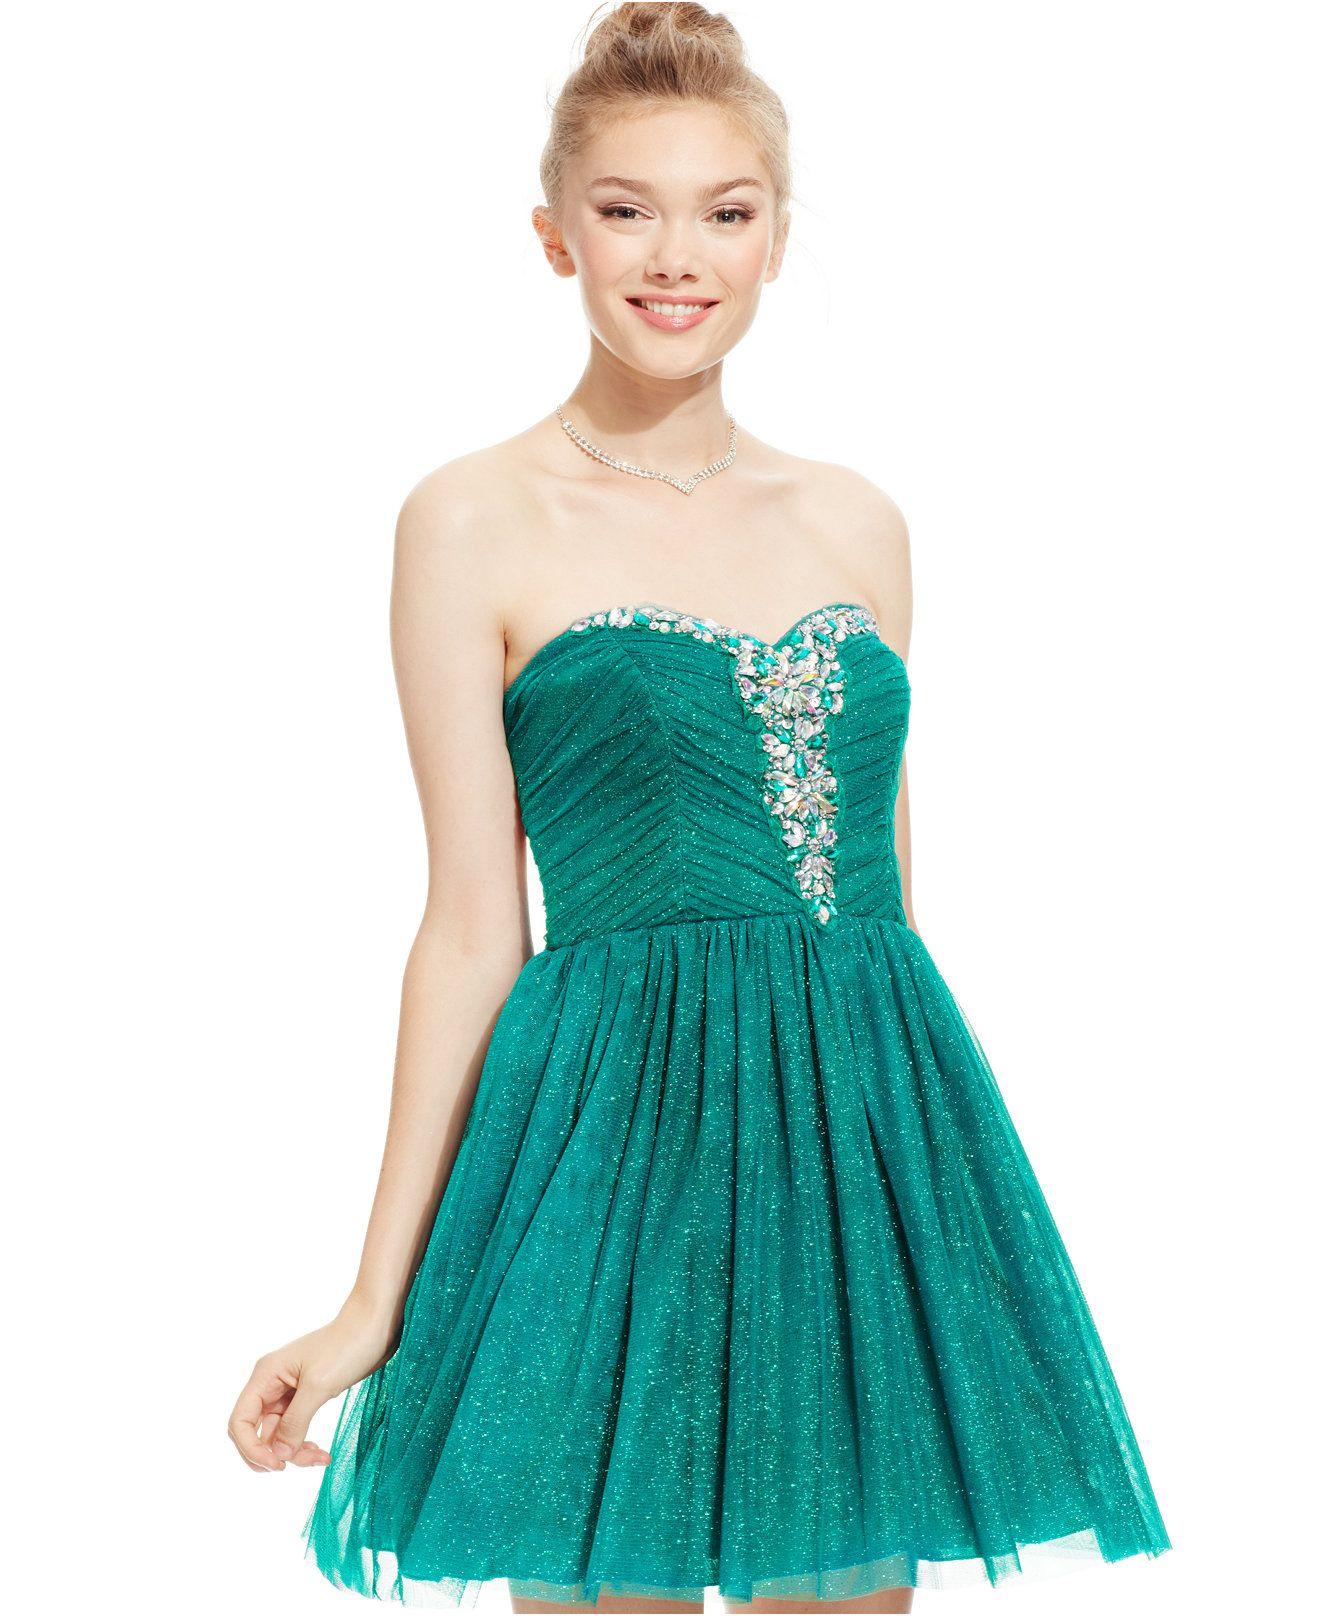 Luxury Party Junior Dresses Festooning - All Wedding Dresses ...